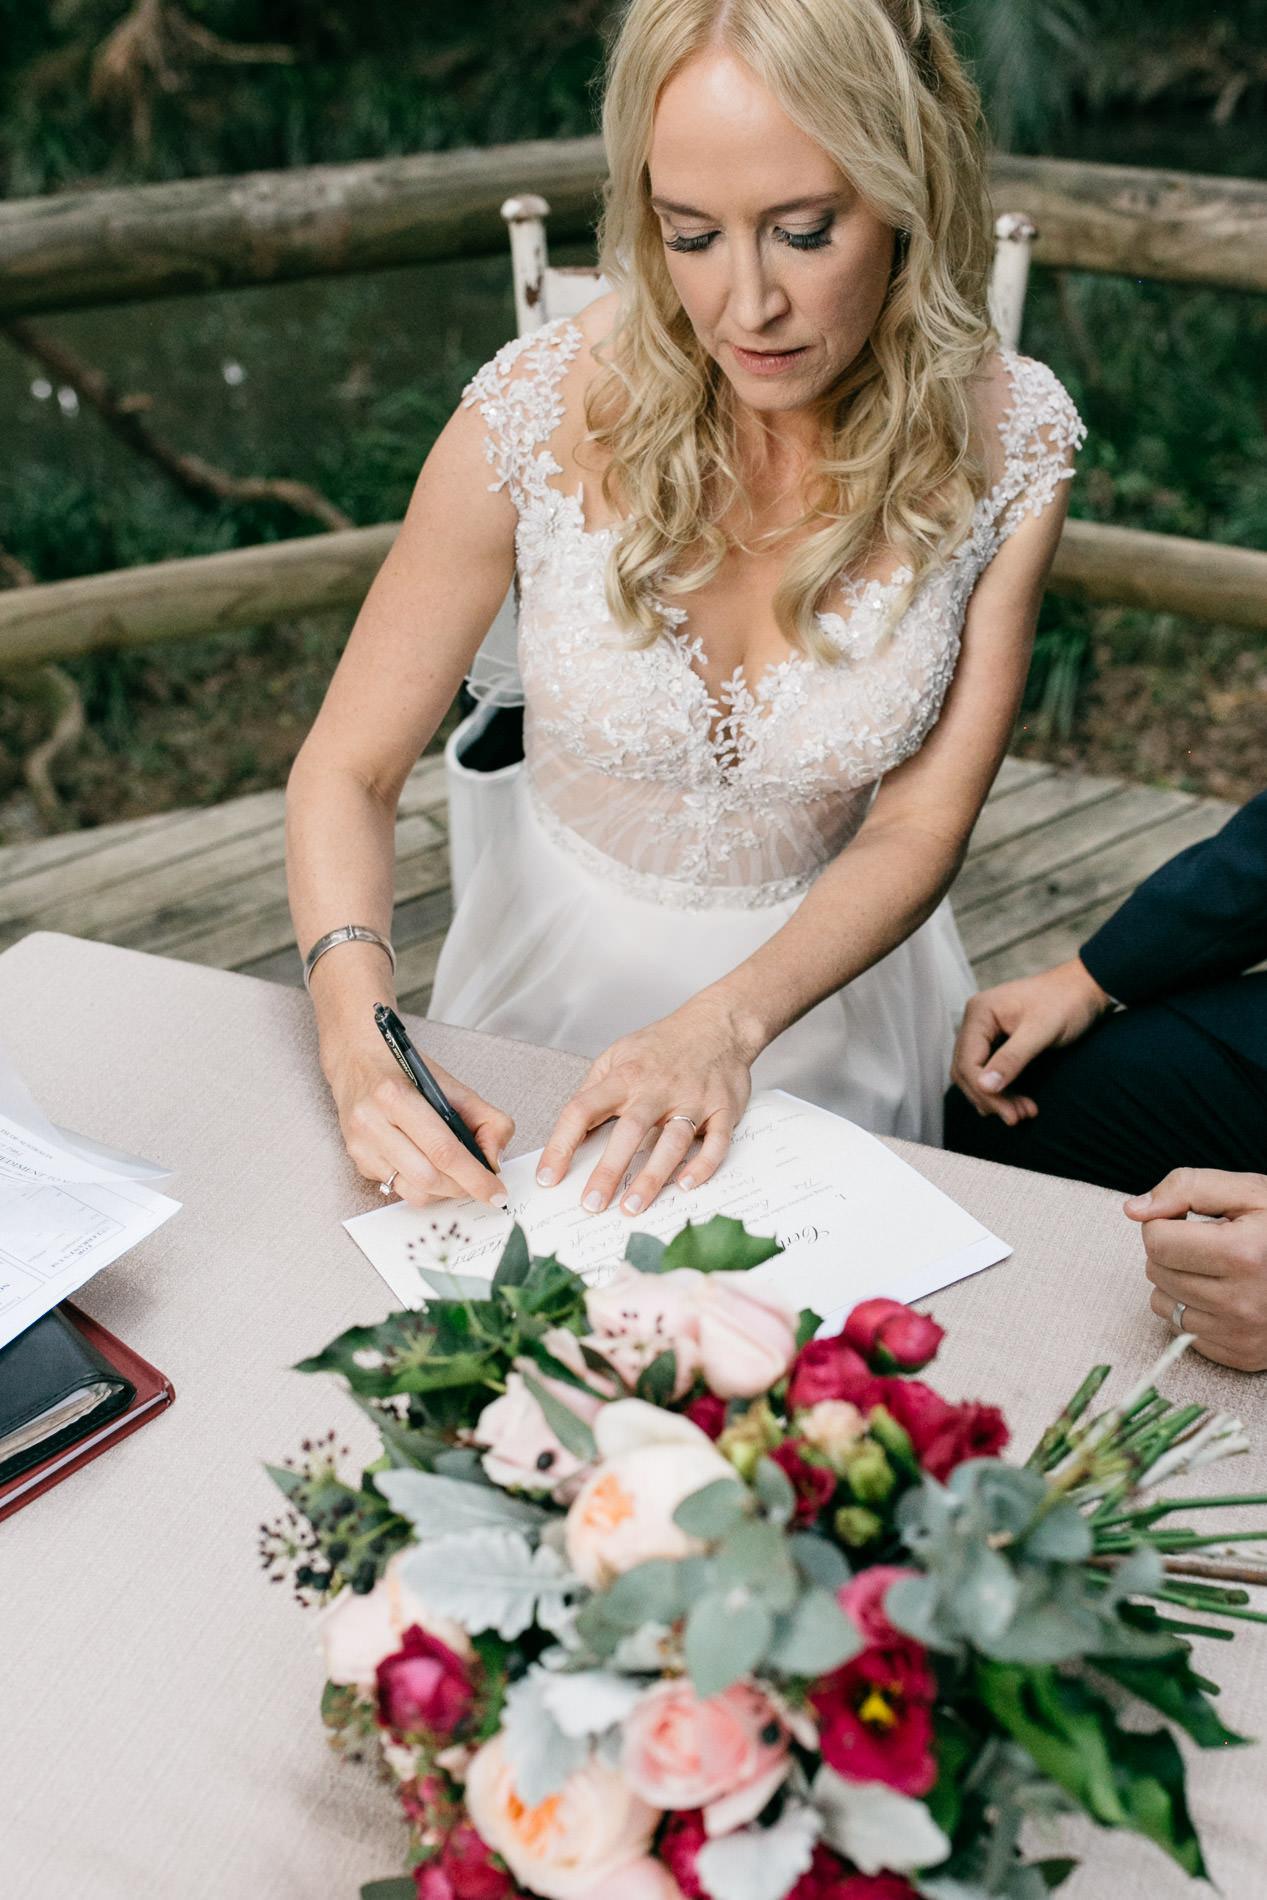 True North Photography_Boomerang Farm_Stacey and Isaac_Gold Coast Wedding_Barm Wedding_Hinterland Wedding-105.jpg